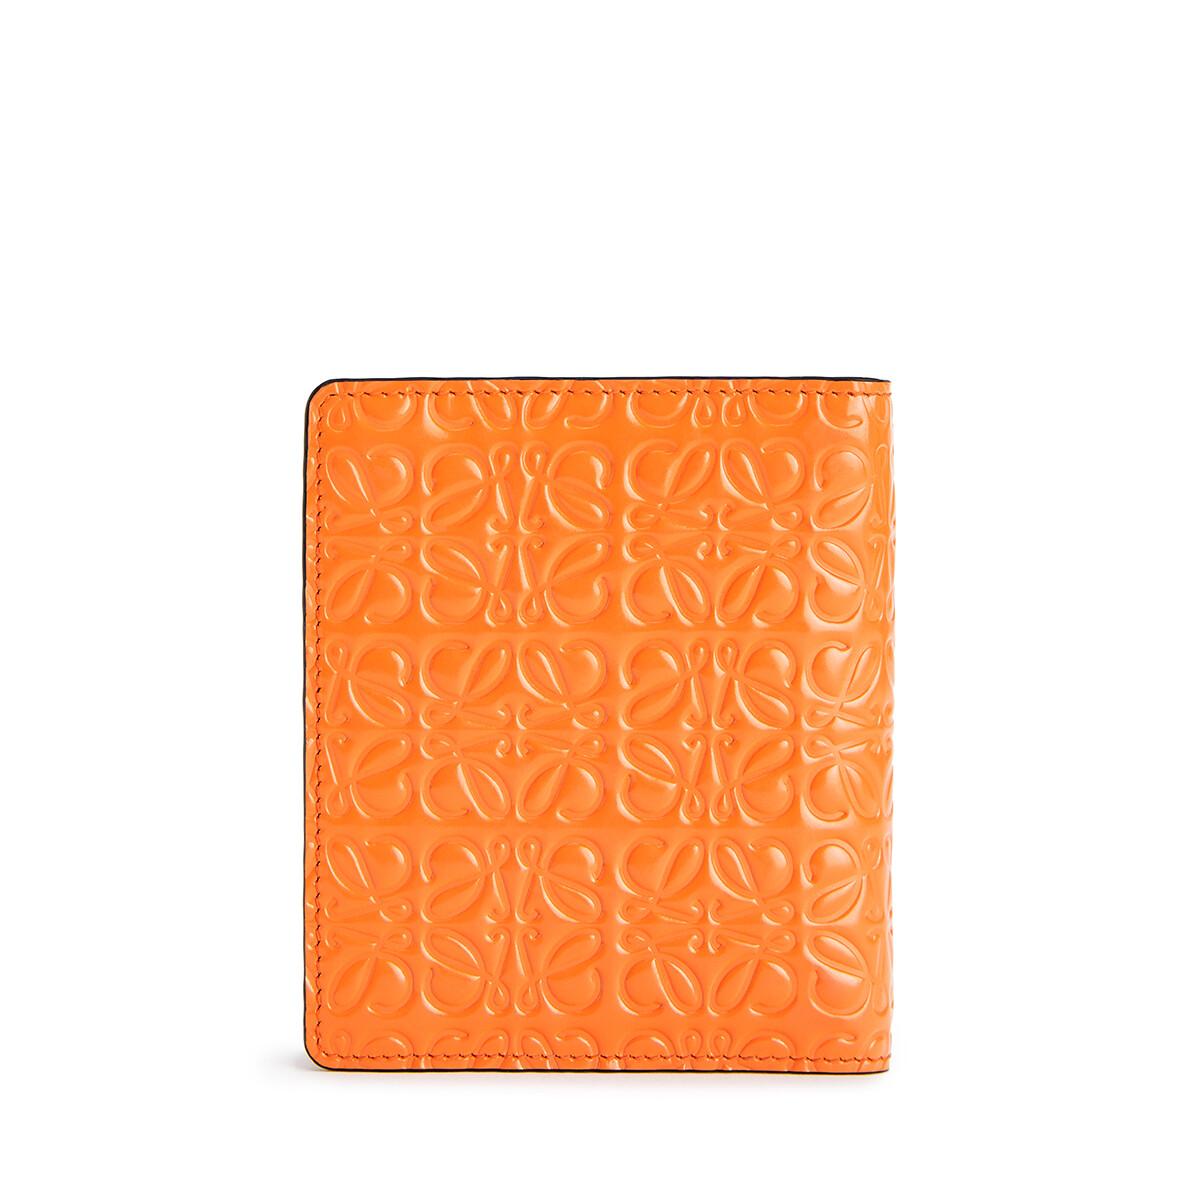 LOEWE Cartera Compact Zip Naranja front